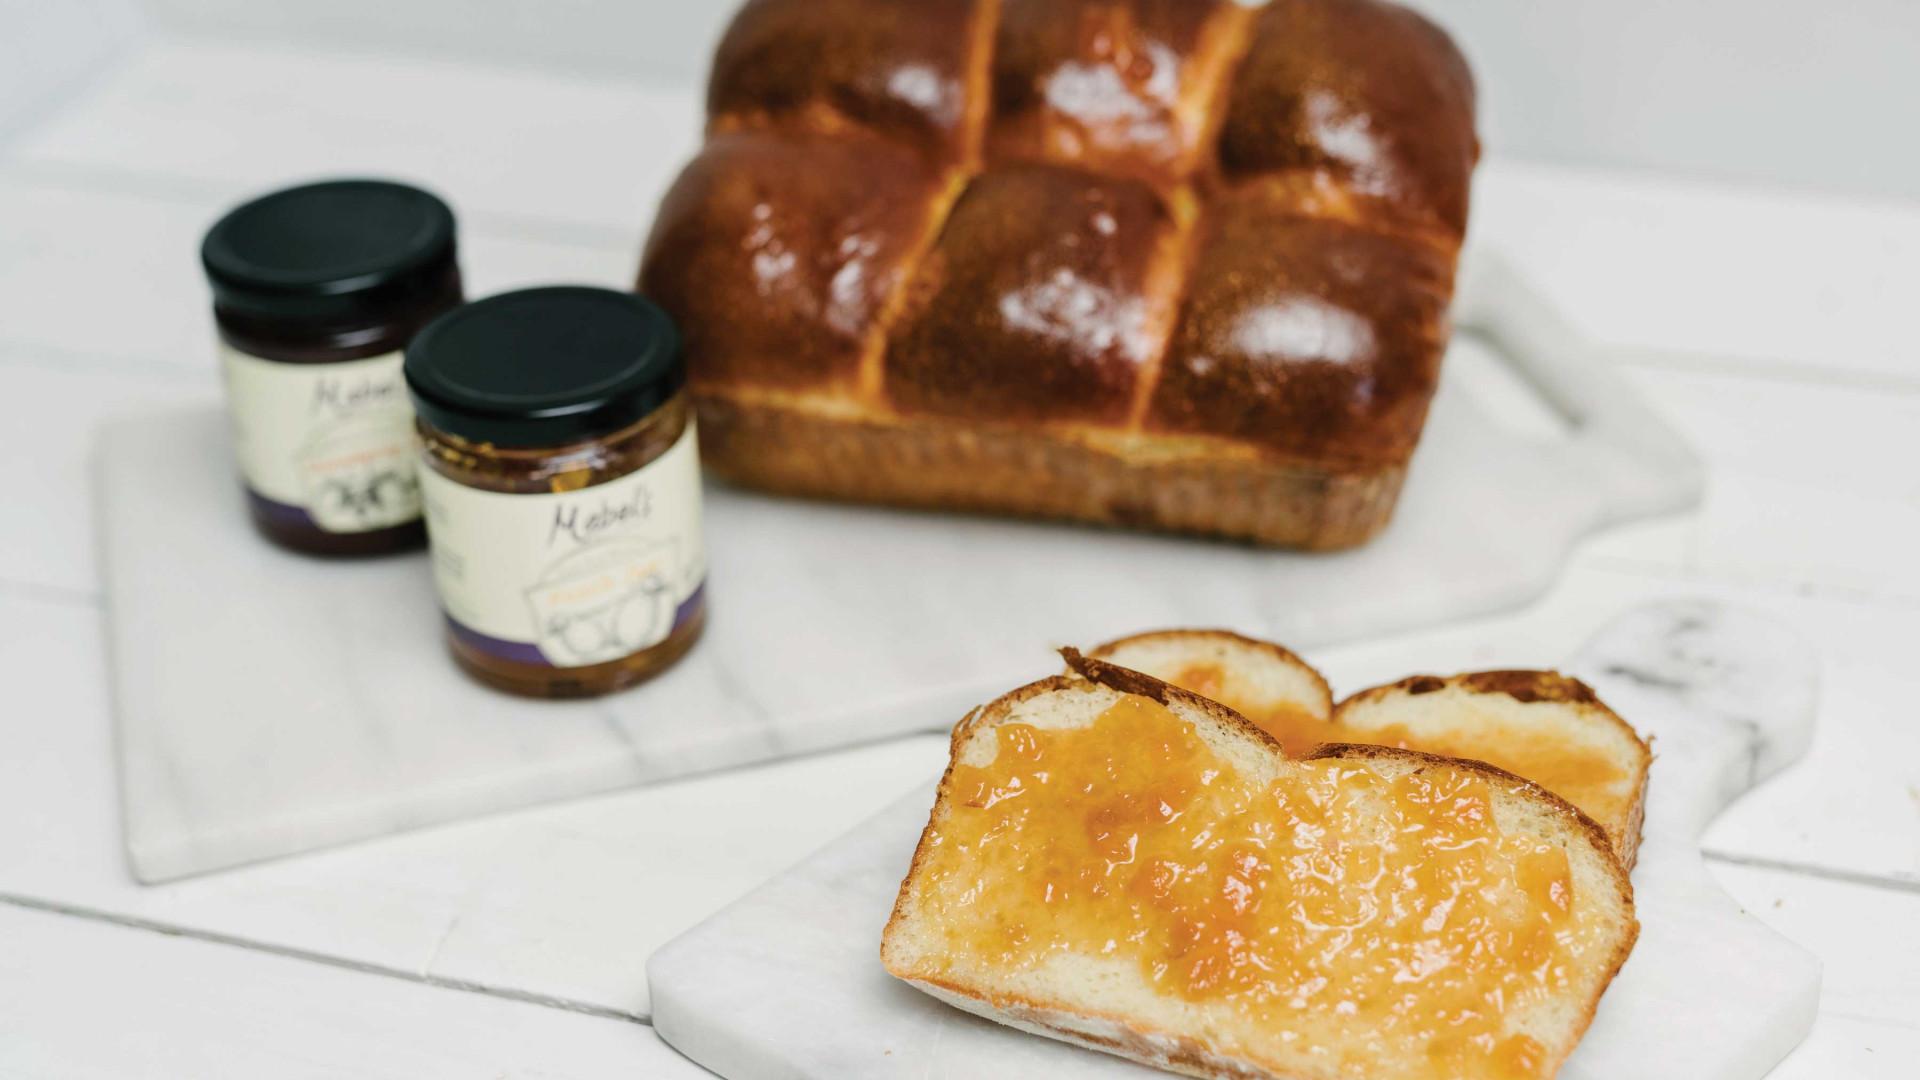 Baking bread: Mabel's Bakery challah bread